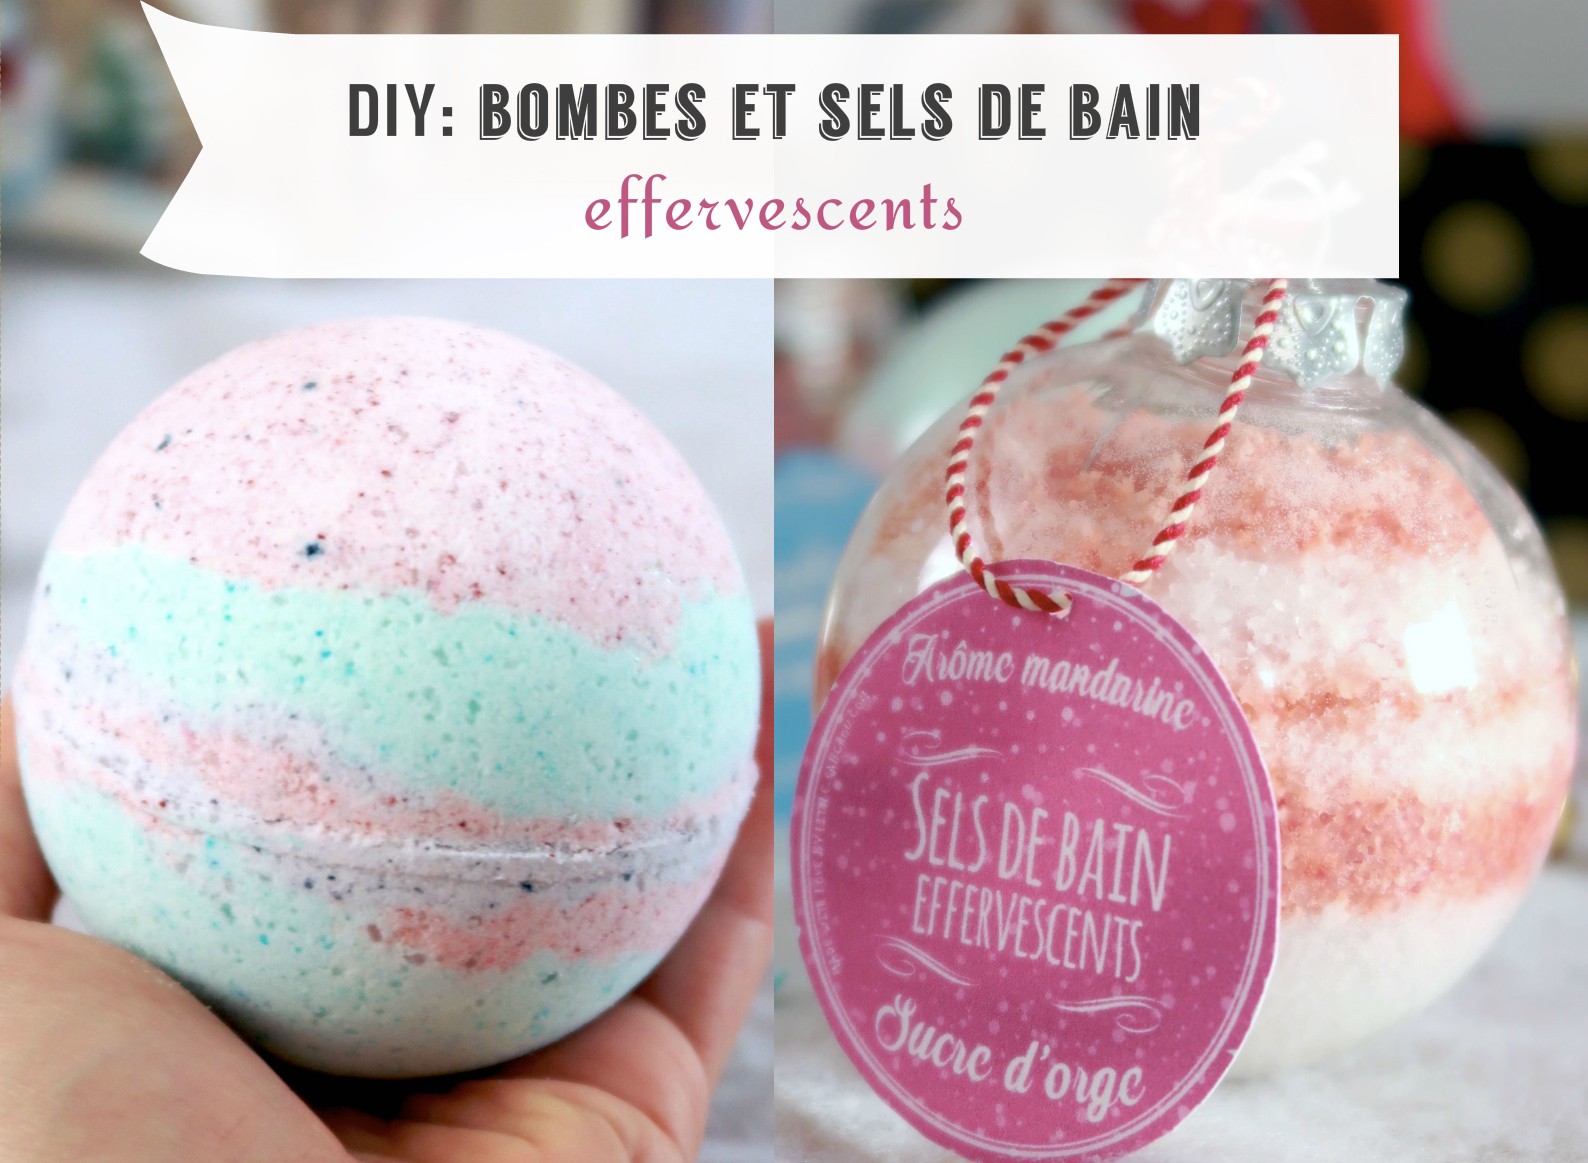 Tuto Bombe De Bain Façon Lush Et Sels De Bain Effervescents